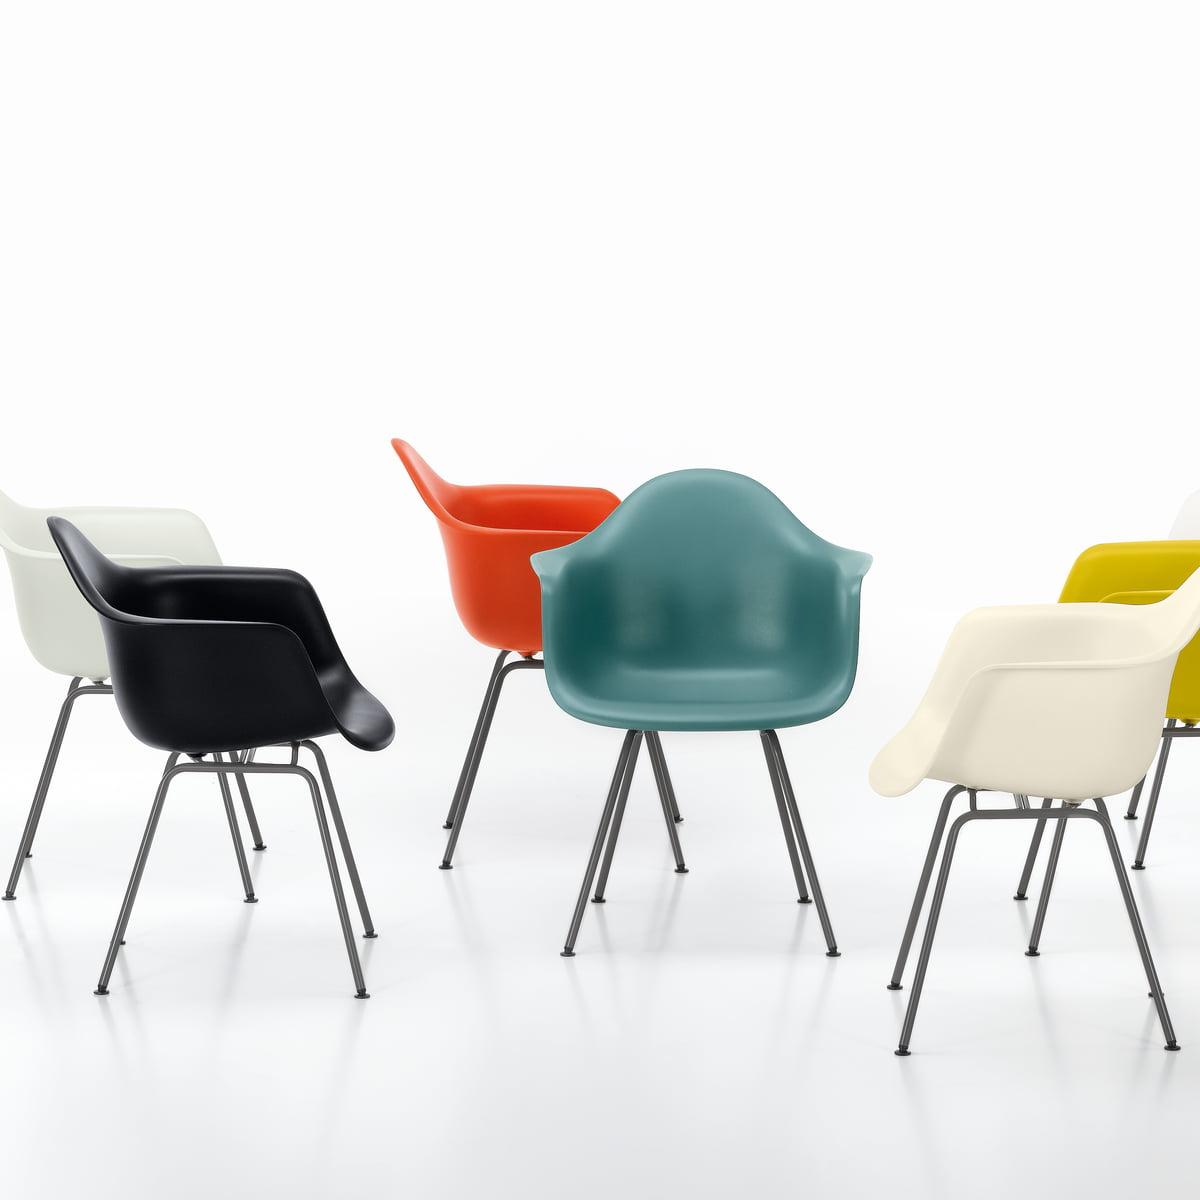 Eames Plastic Armchair   DAX. Eames Plastic Armchair DAX by Vitra